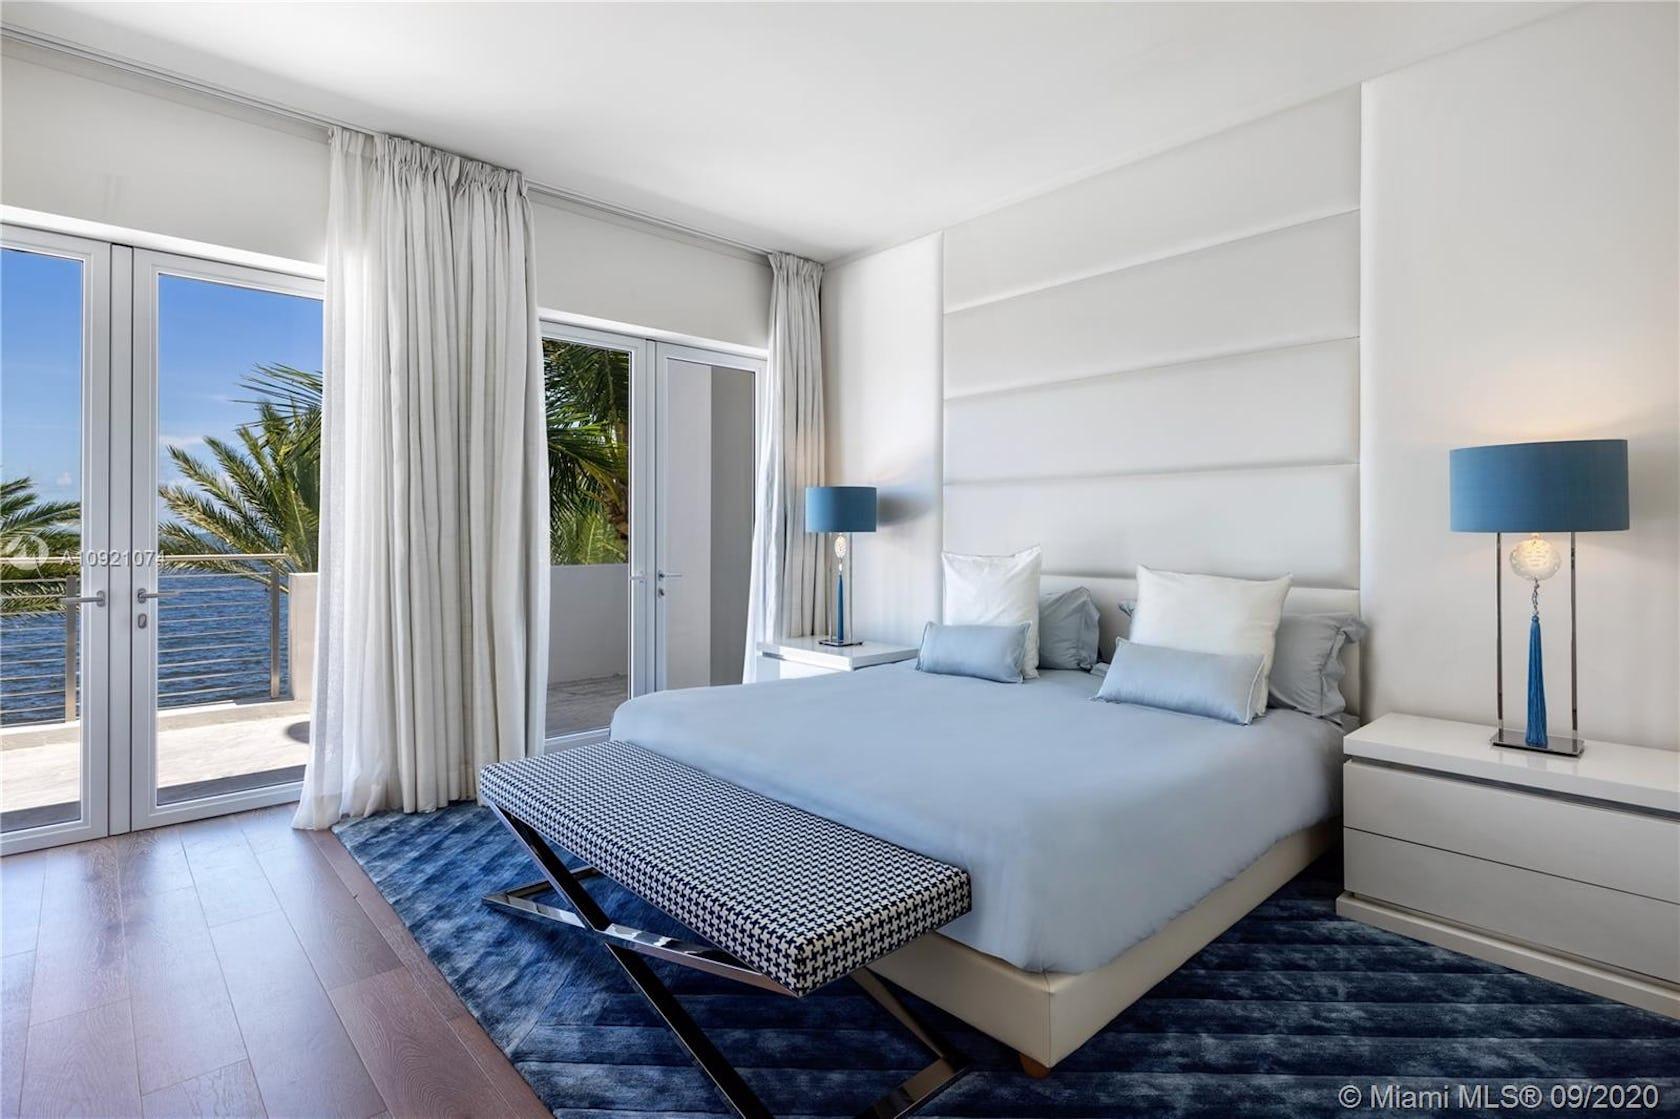 bedroom indoors room furniture interior design rug